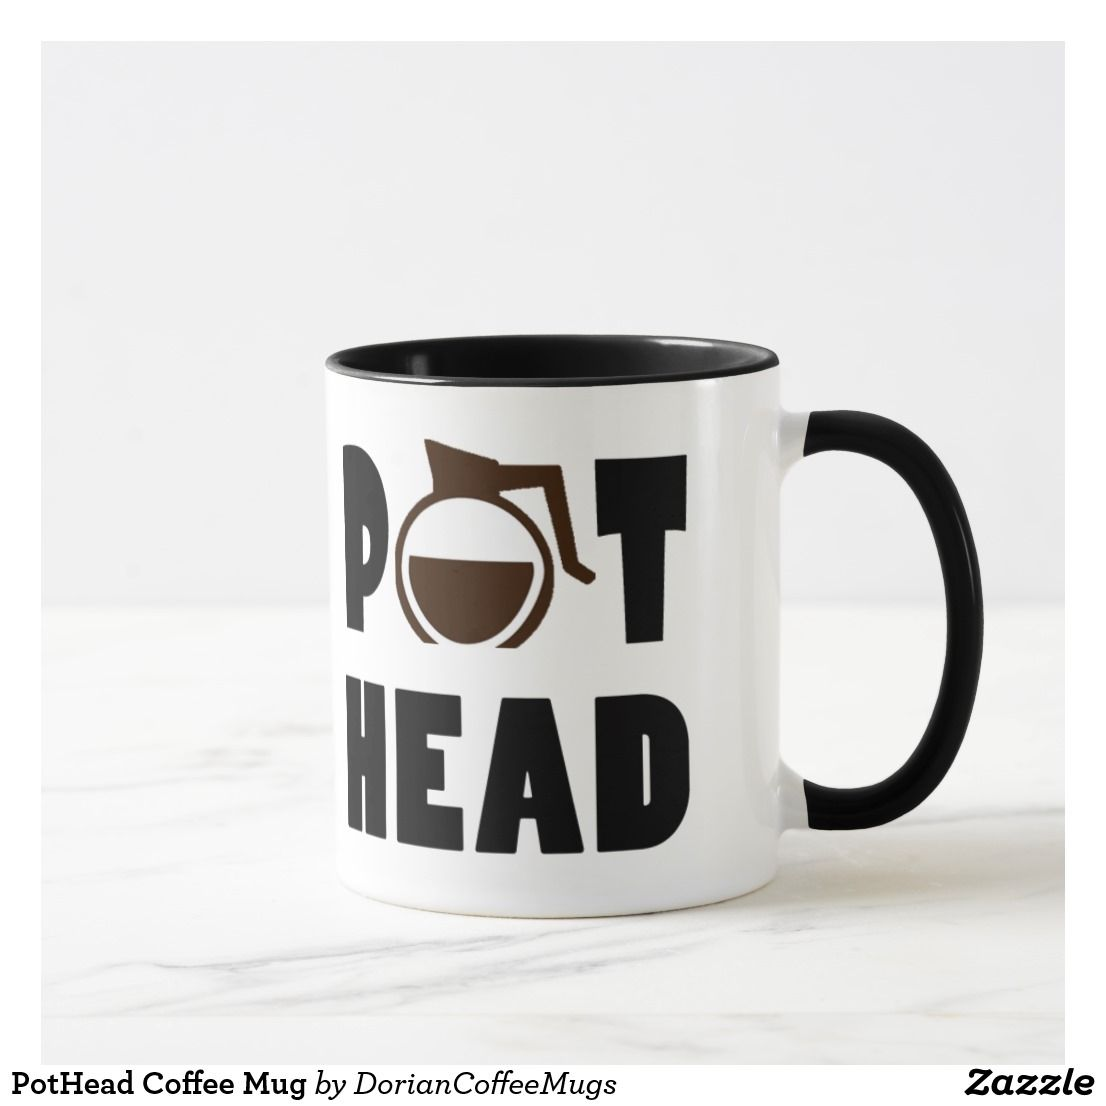 Pothead Coffee Mug Zazzle Com In 2020 Coffee Mugs Mugs Pot Head Coffee